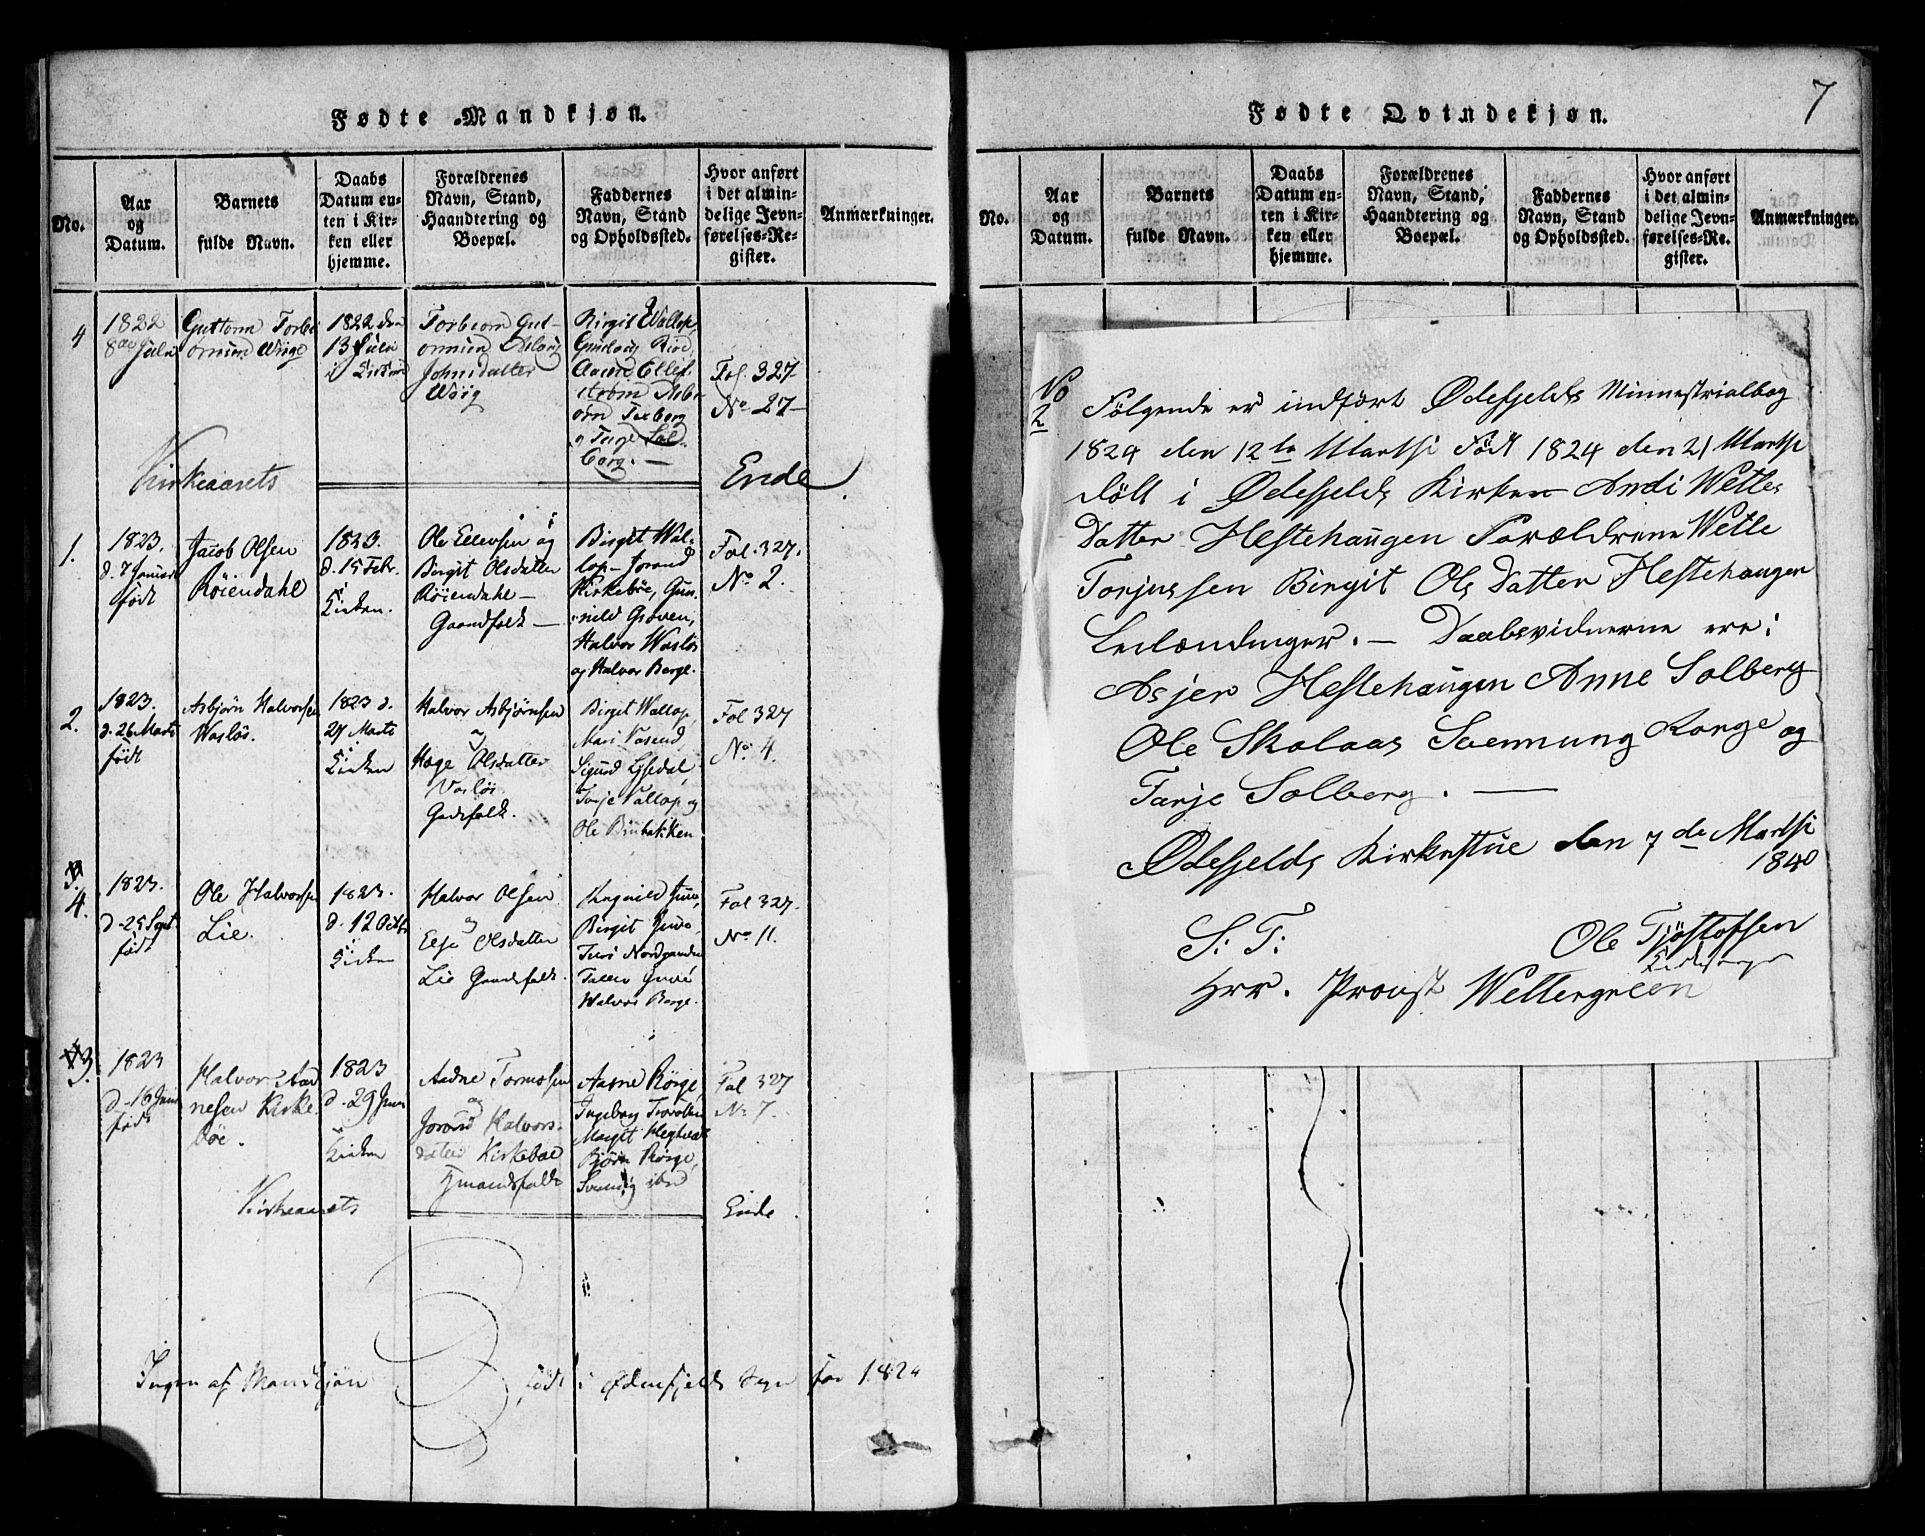 SAKO, Rauland kirkebøker, F/Fa/L0002: Ministerialbok nr. 2, 1815-1860, s. 7